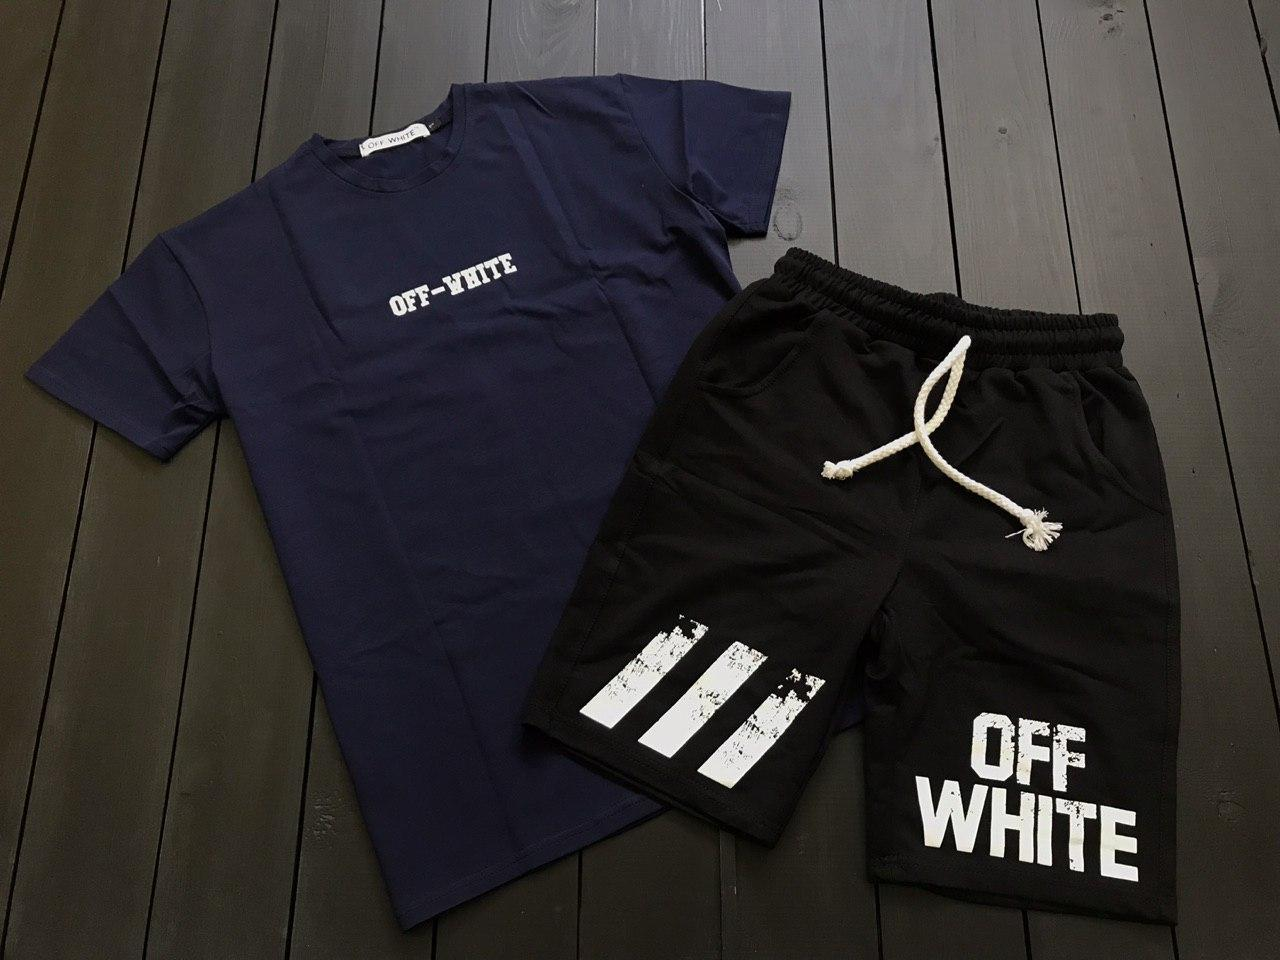 Мужской летний комплект Off-white (шорты и футболка), шорты off-white, футболка Off-white